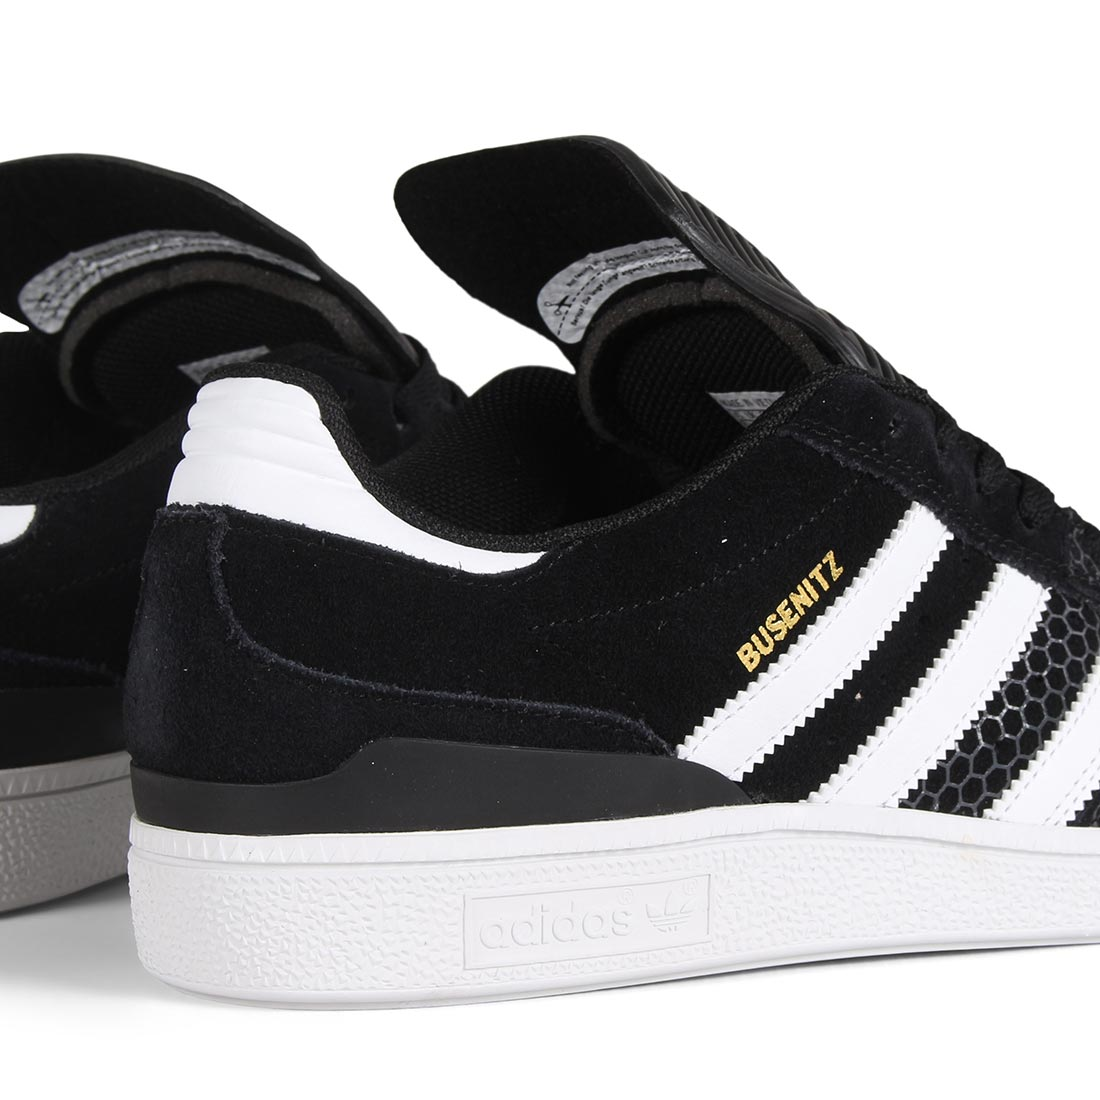 Adidas Busenitz Pro Shoes - Core Black